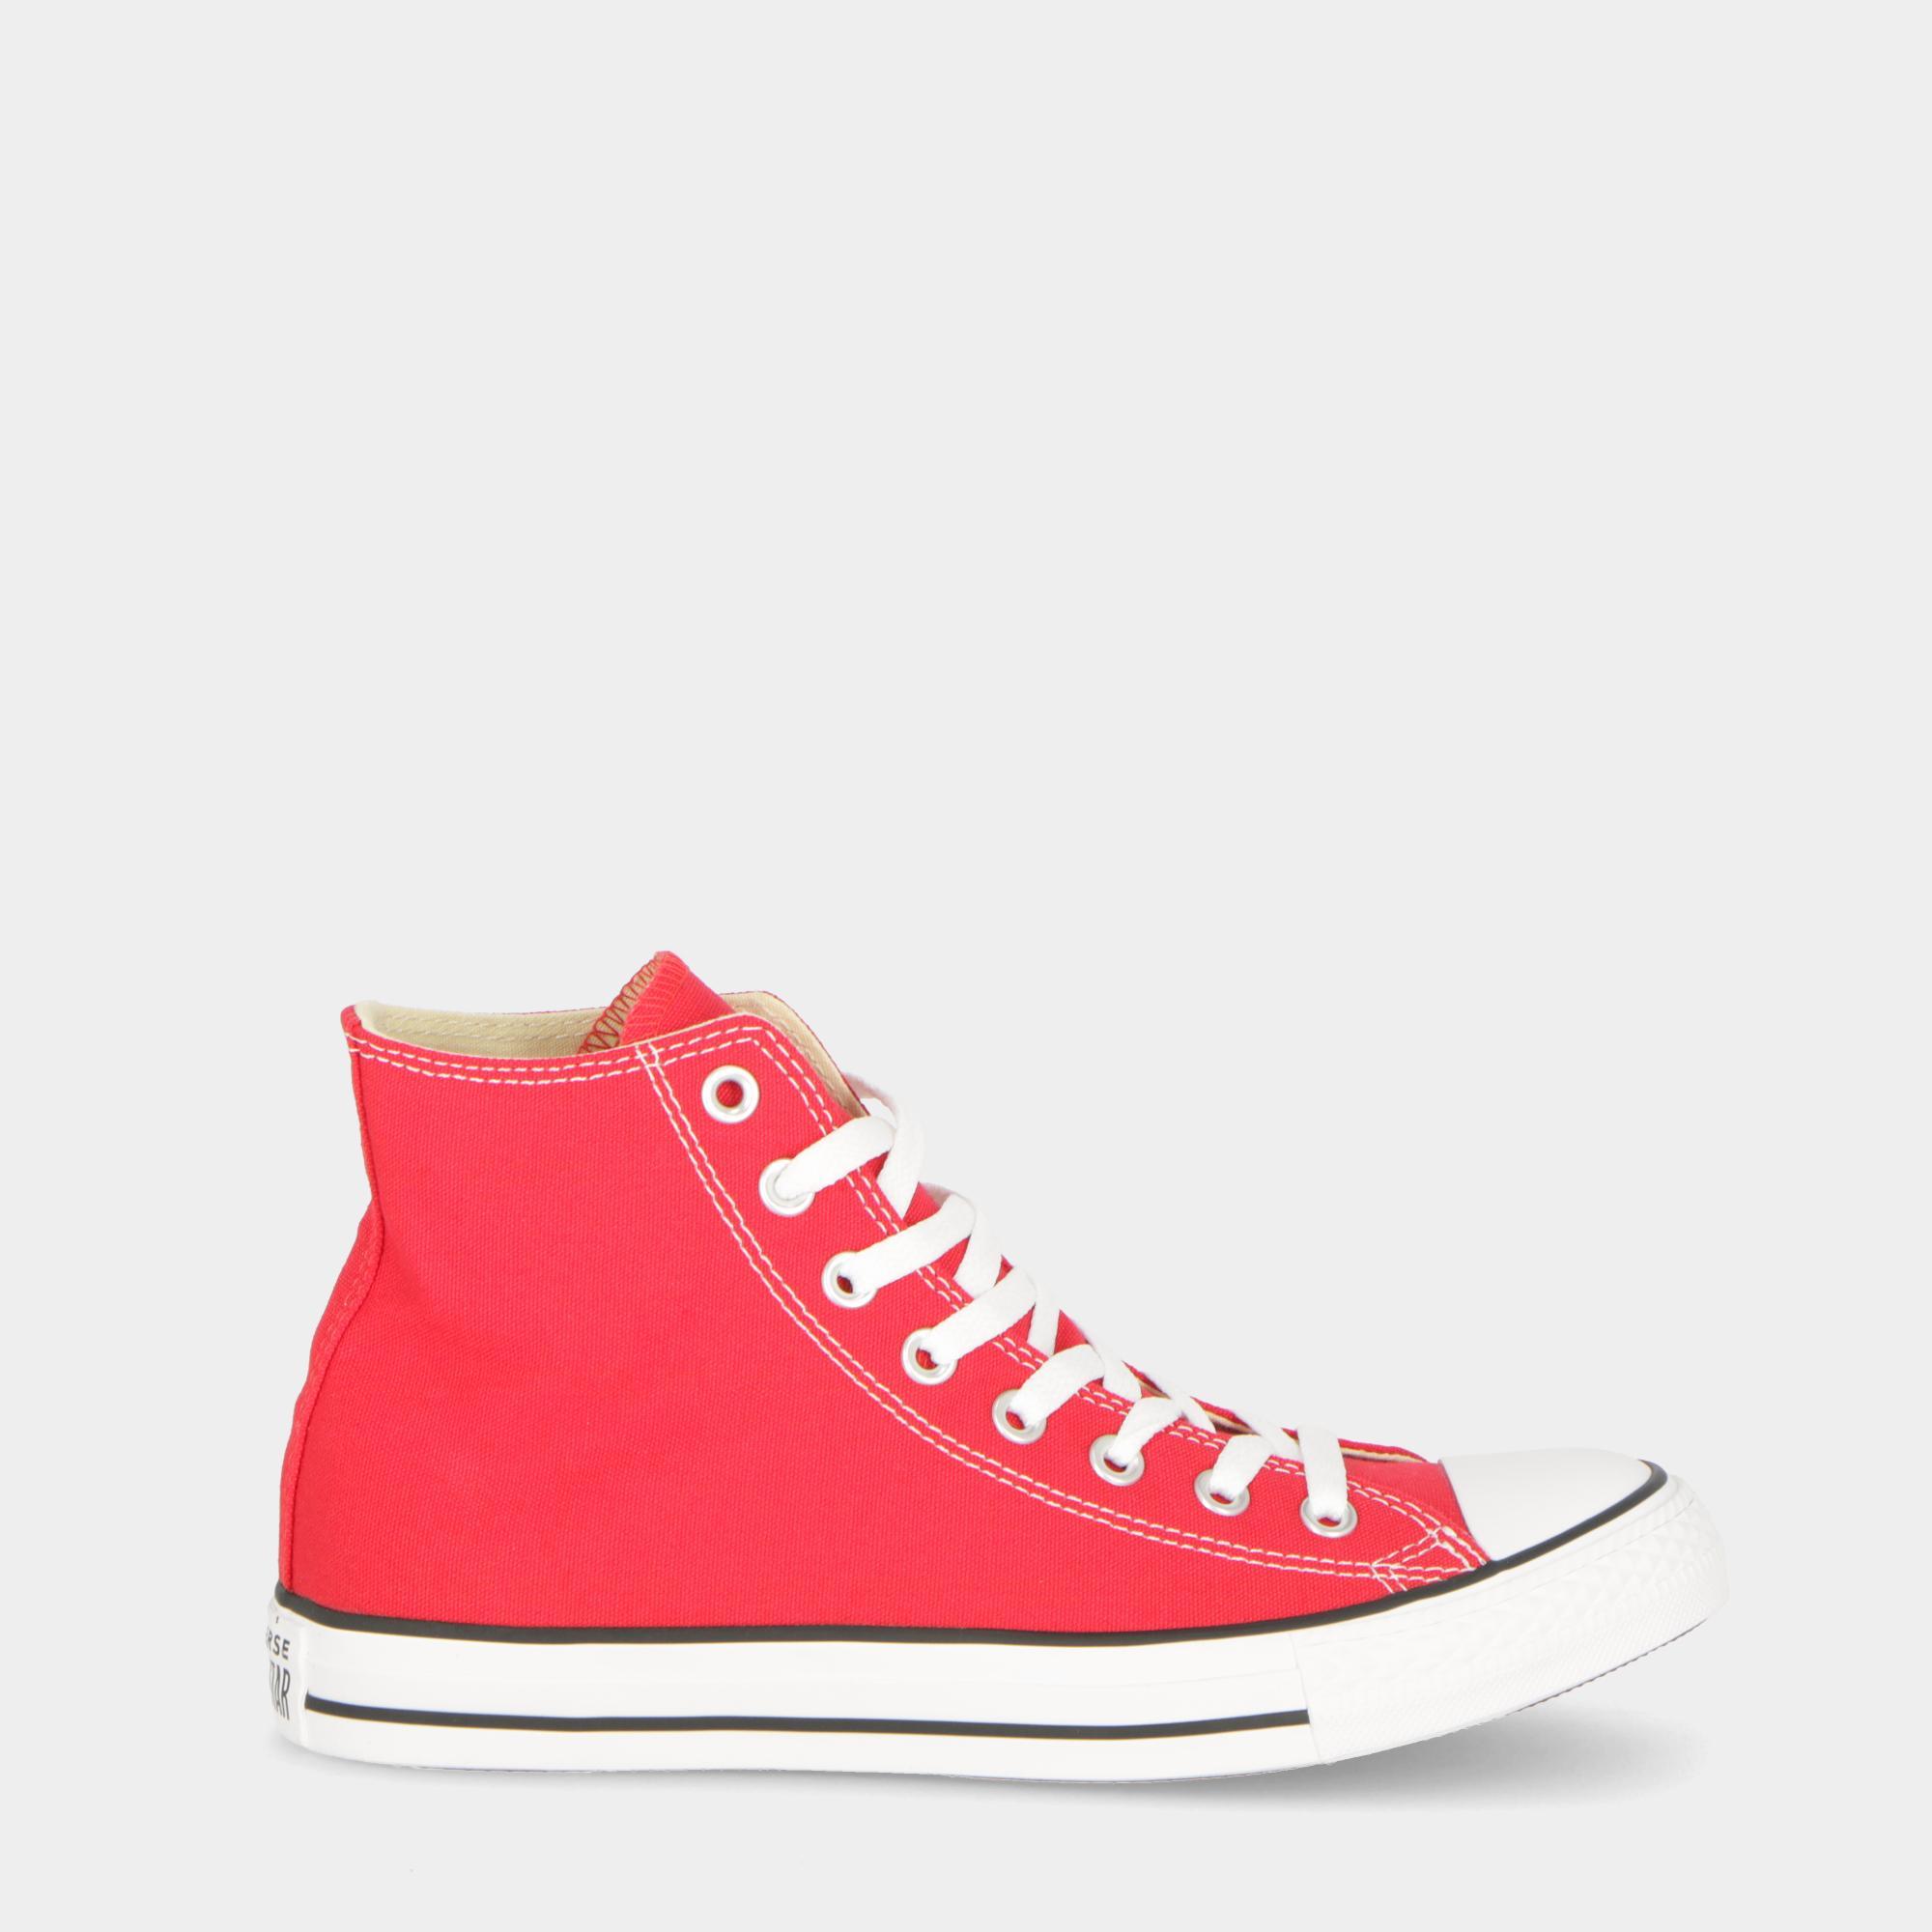 Converse Chuck Taylor All Star Hi Canvas Red  590e192b73